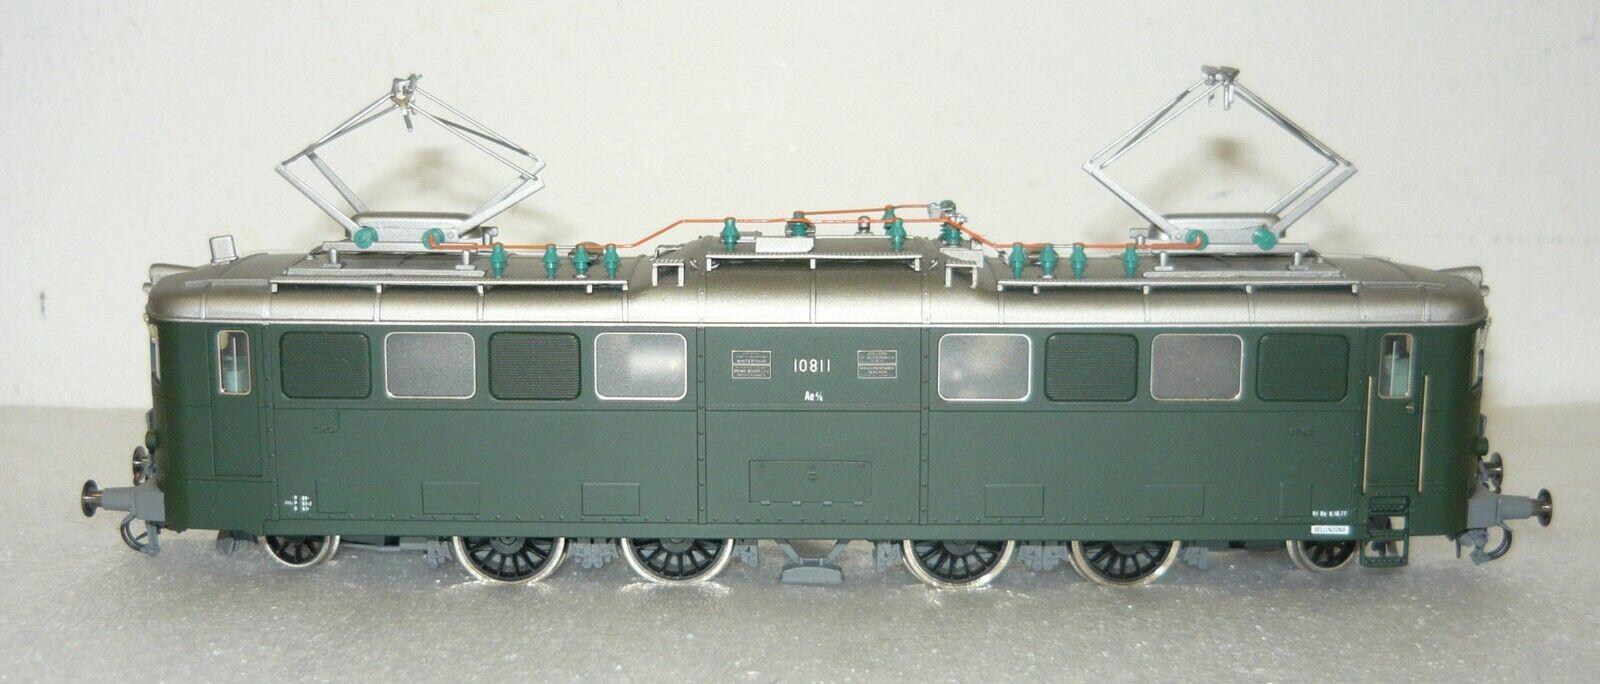 Lemaco ho-022 1, ellok AE 4 6 10811 de los SBB, latón-handarbeitsmod., h0, neu&ovp